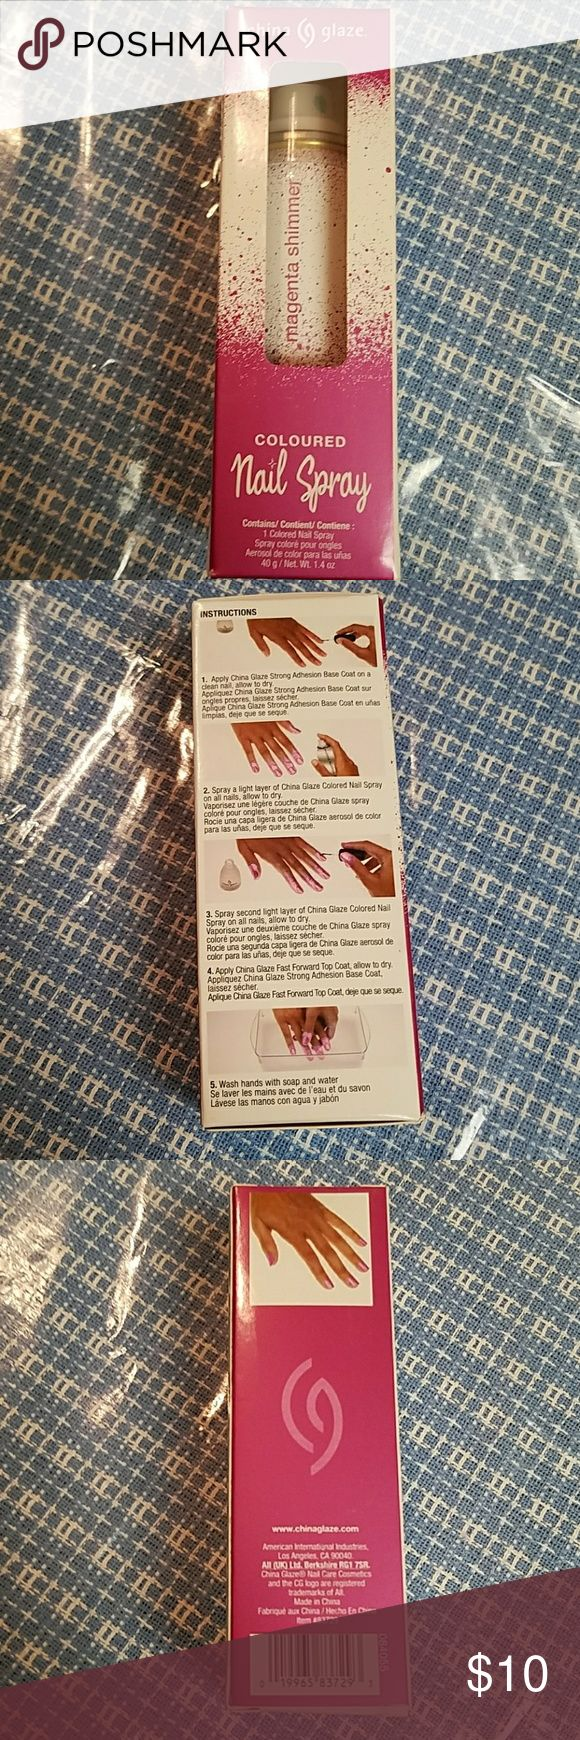 Spray on nail polish china glaze nail spray reviews - Darker Pink Spray On Nail Polish Spray On Nail Polish New Never Taken Out Of The